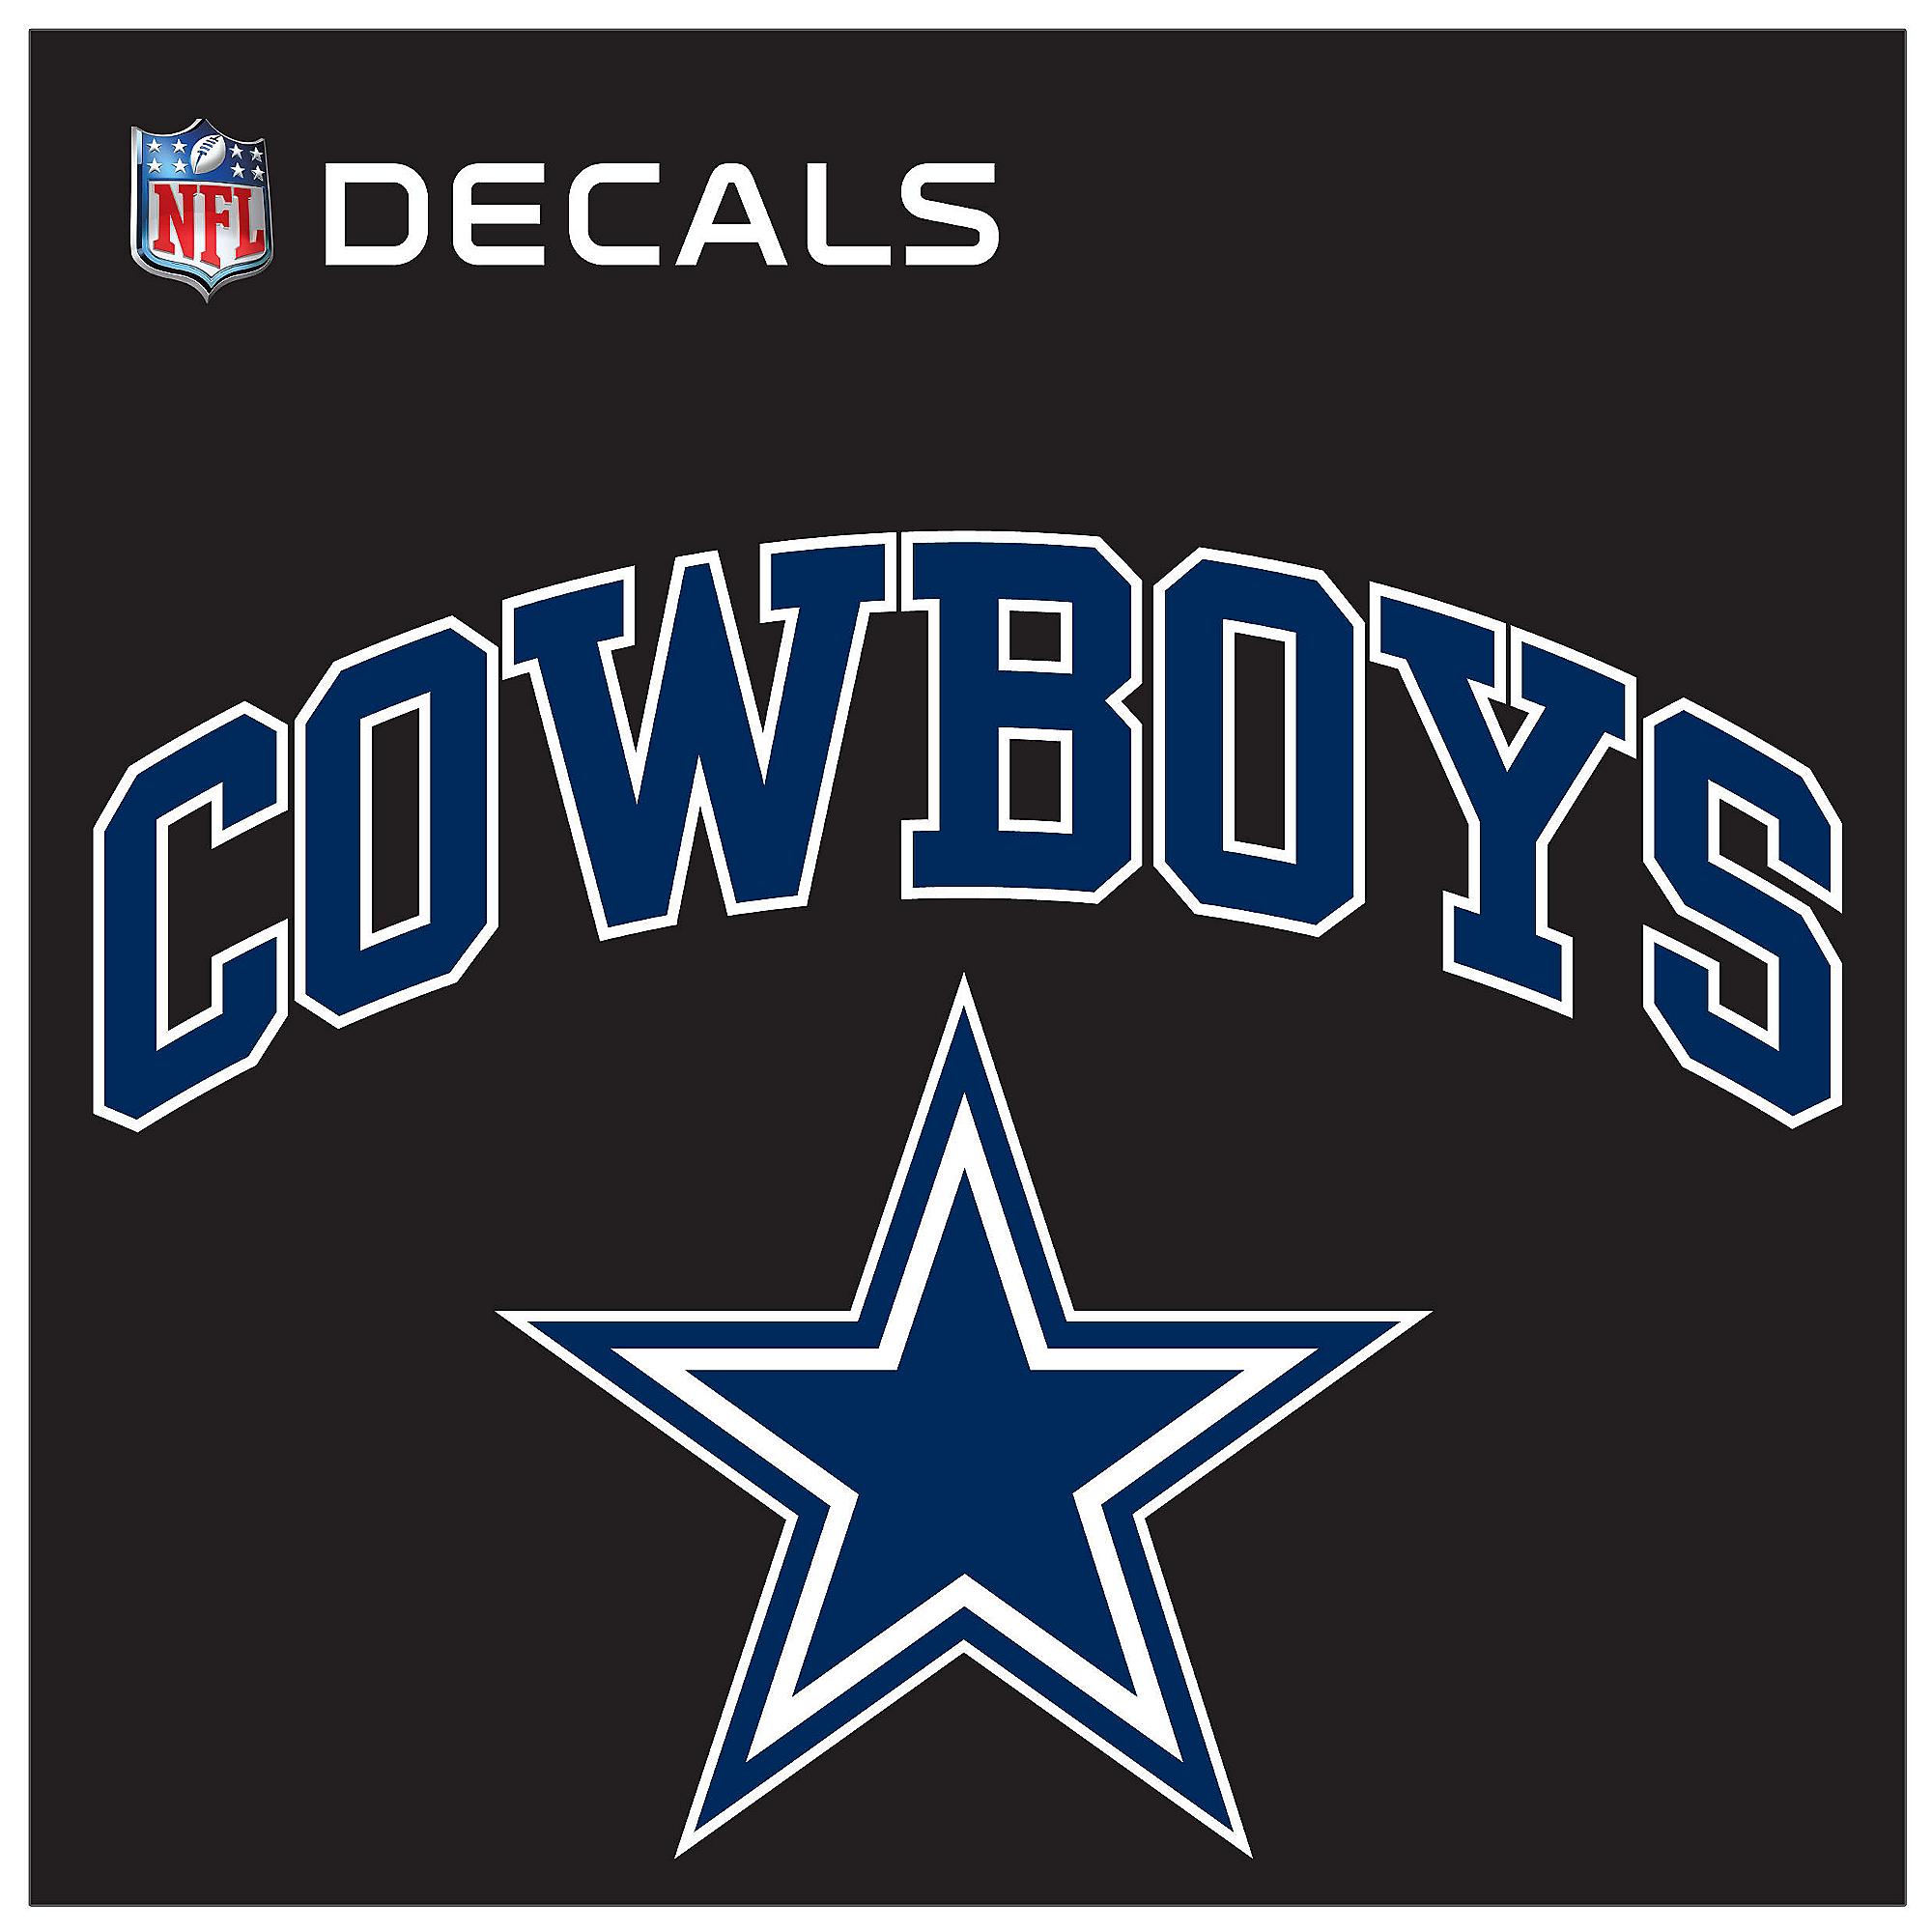 Dallas Cowboys 12x12 Arched Decal  5fde846f6